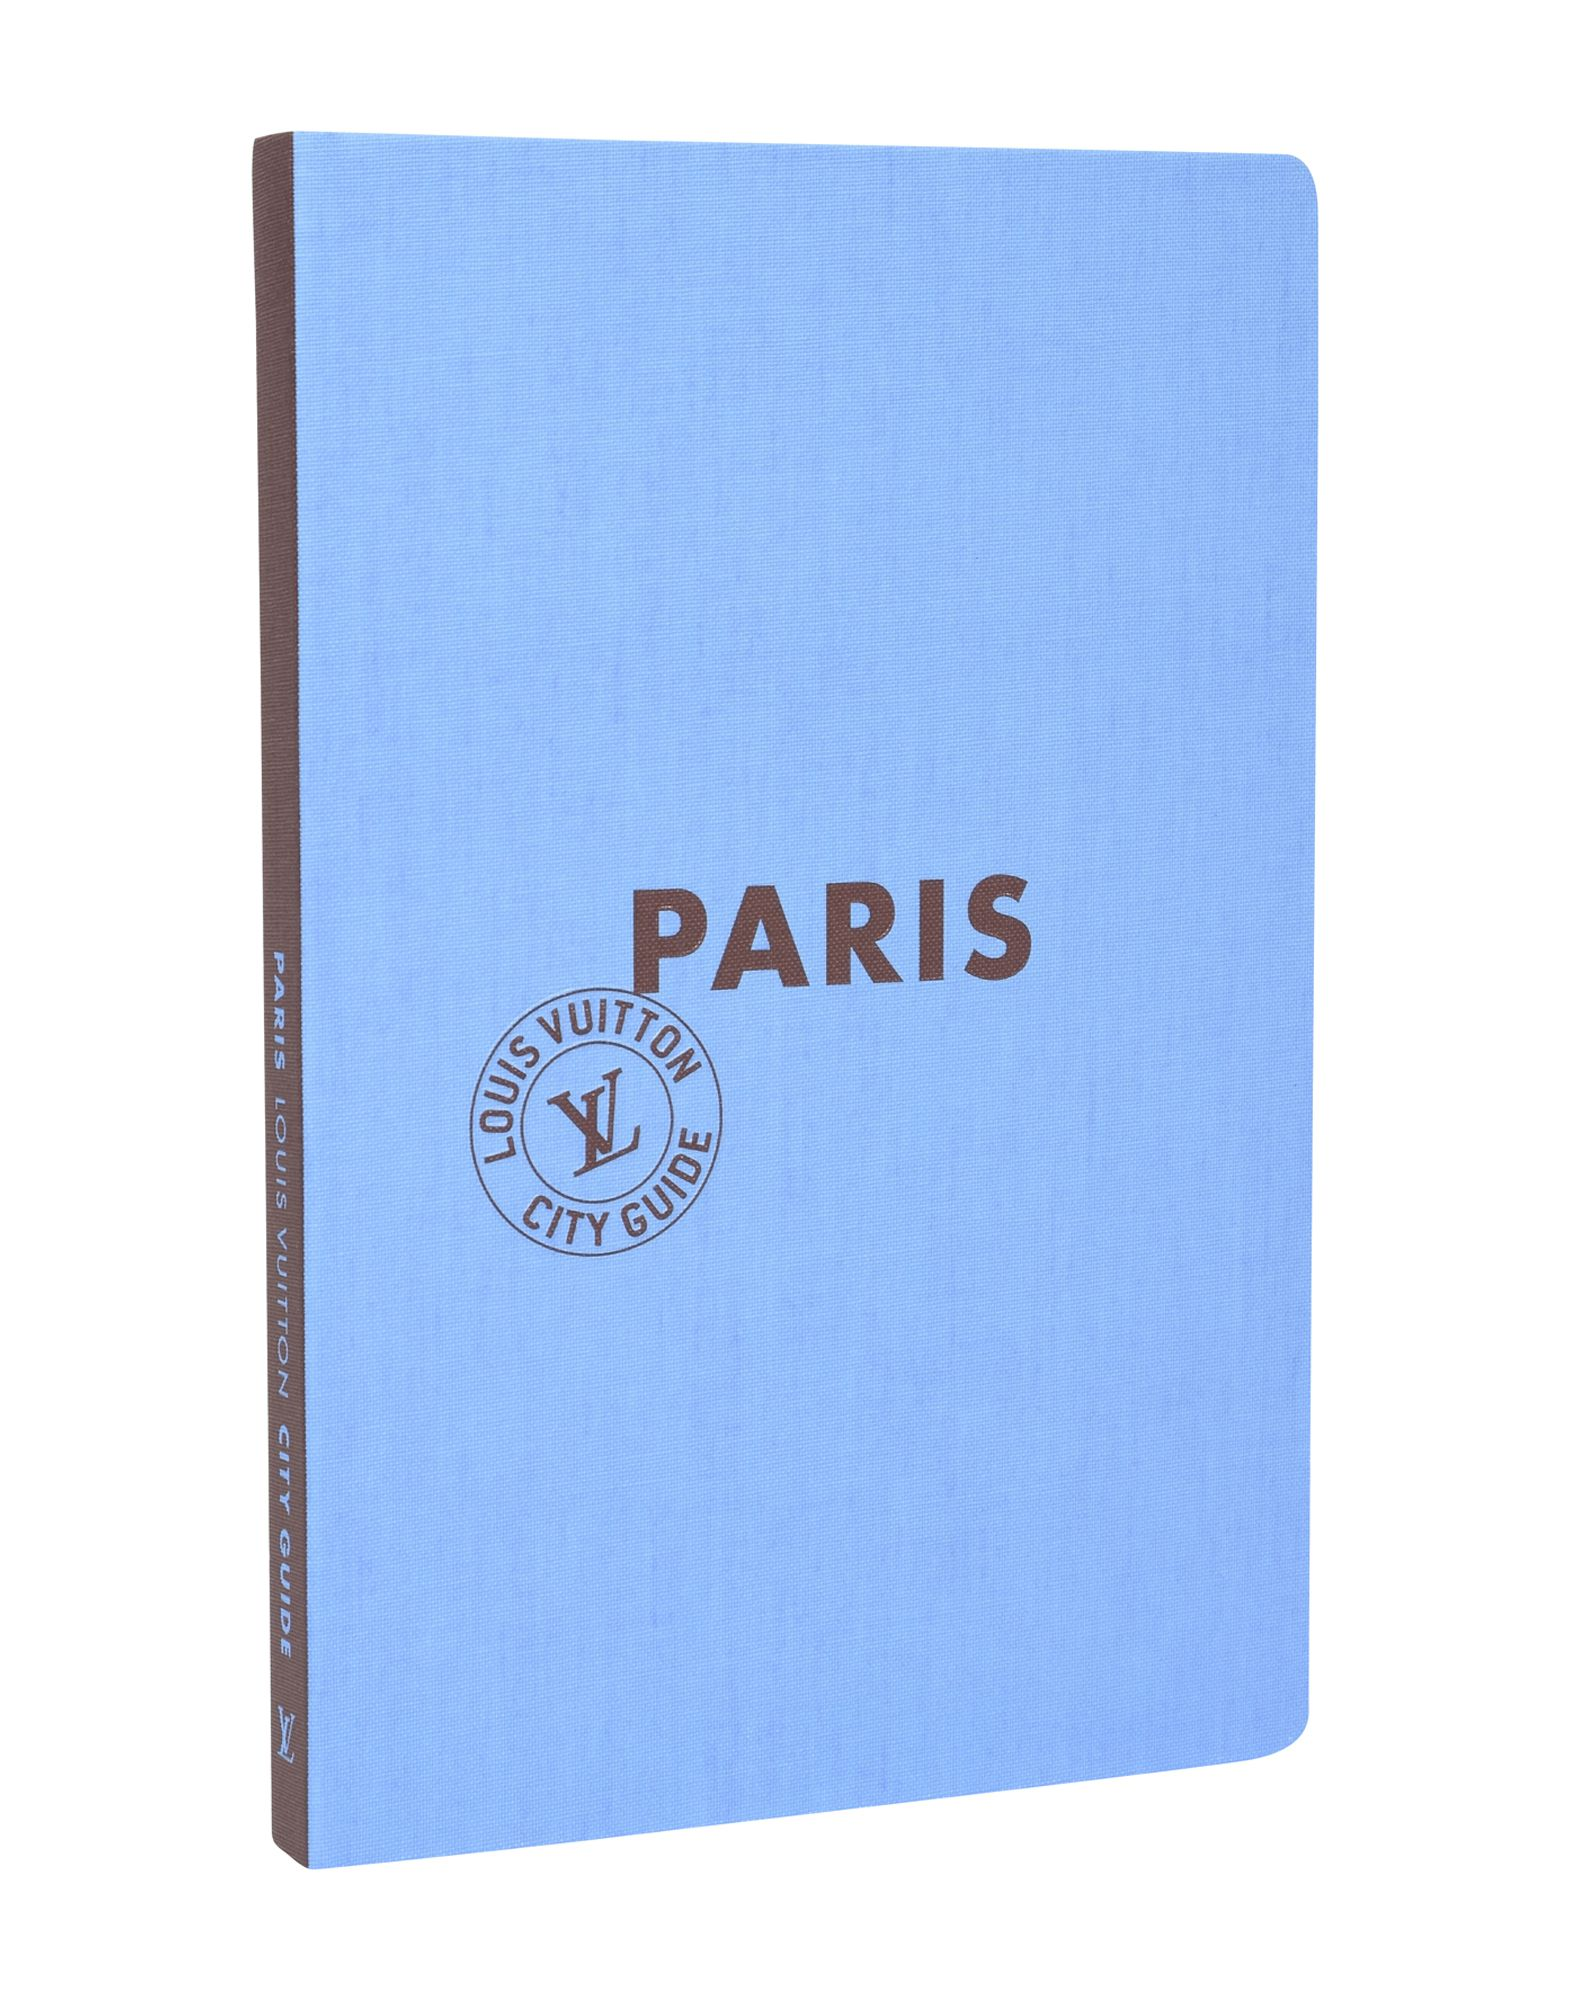 L'IPPOCAMPO Выставочный каталог каталог twinklbaby